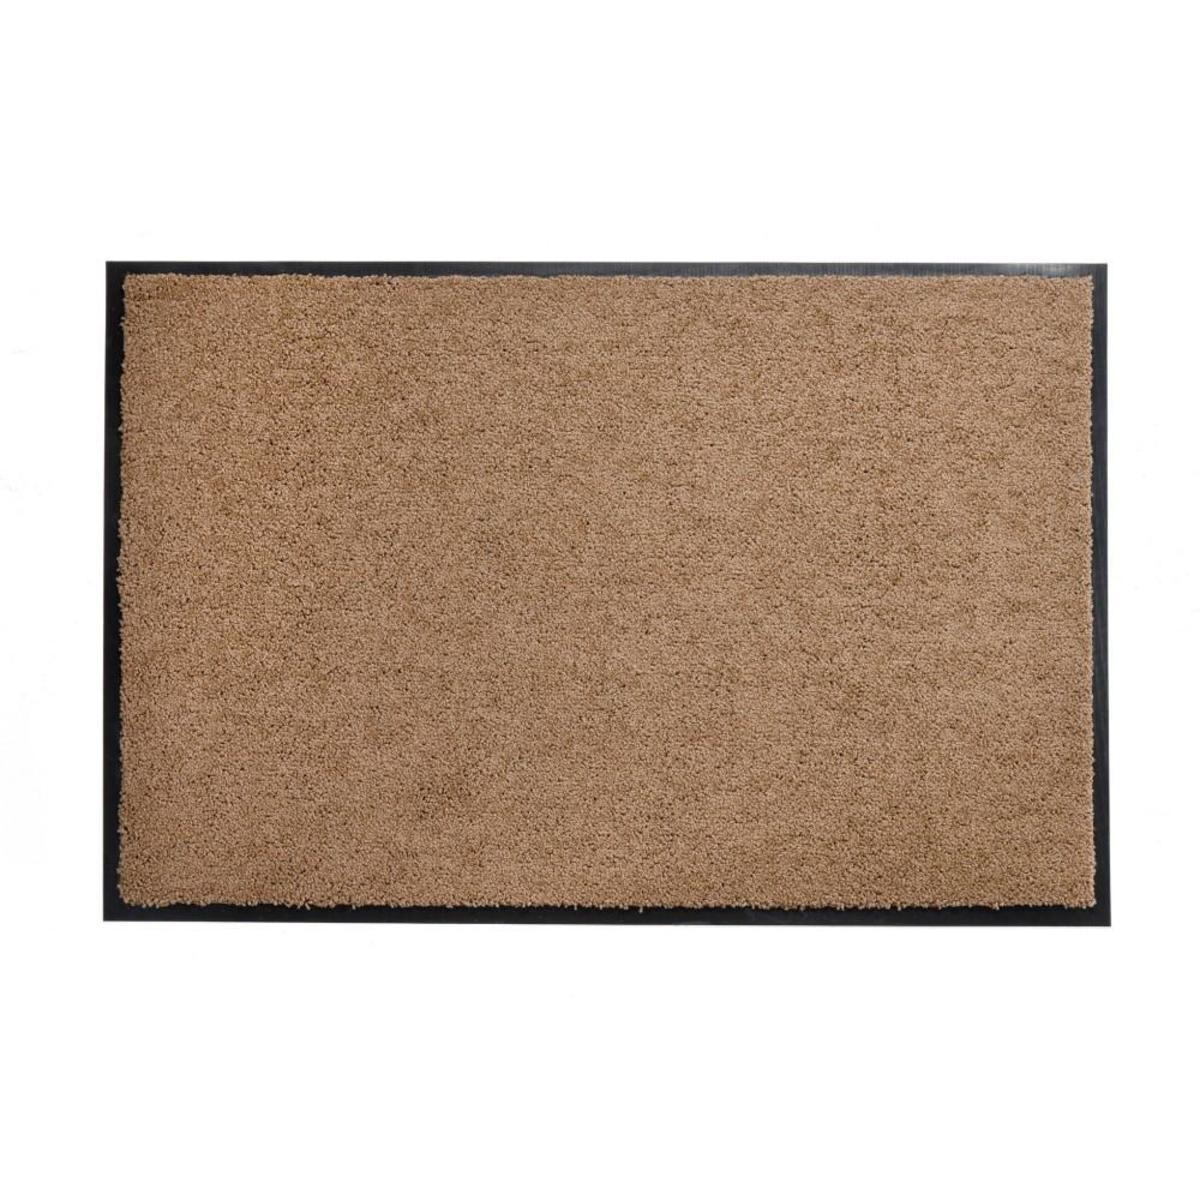 Bild 1 von acerto® EVODIA Premium Schmutzfangmatte Lavendel-Duft taupe - 90x150cm